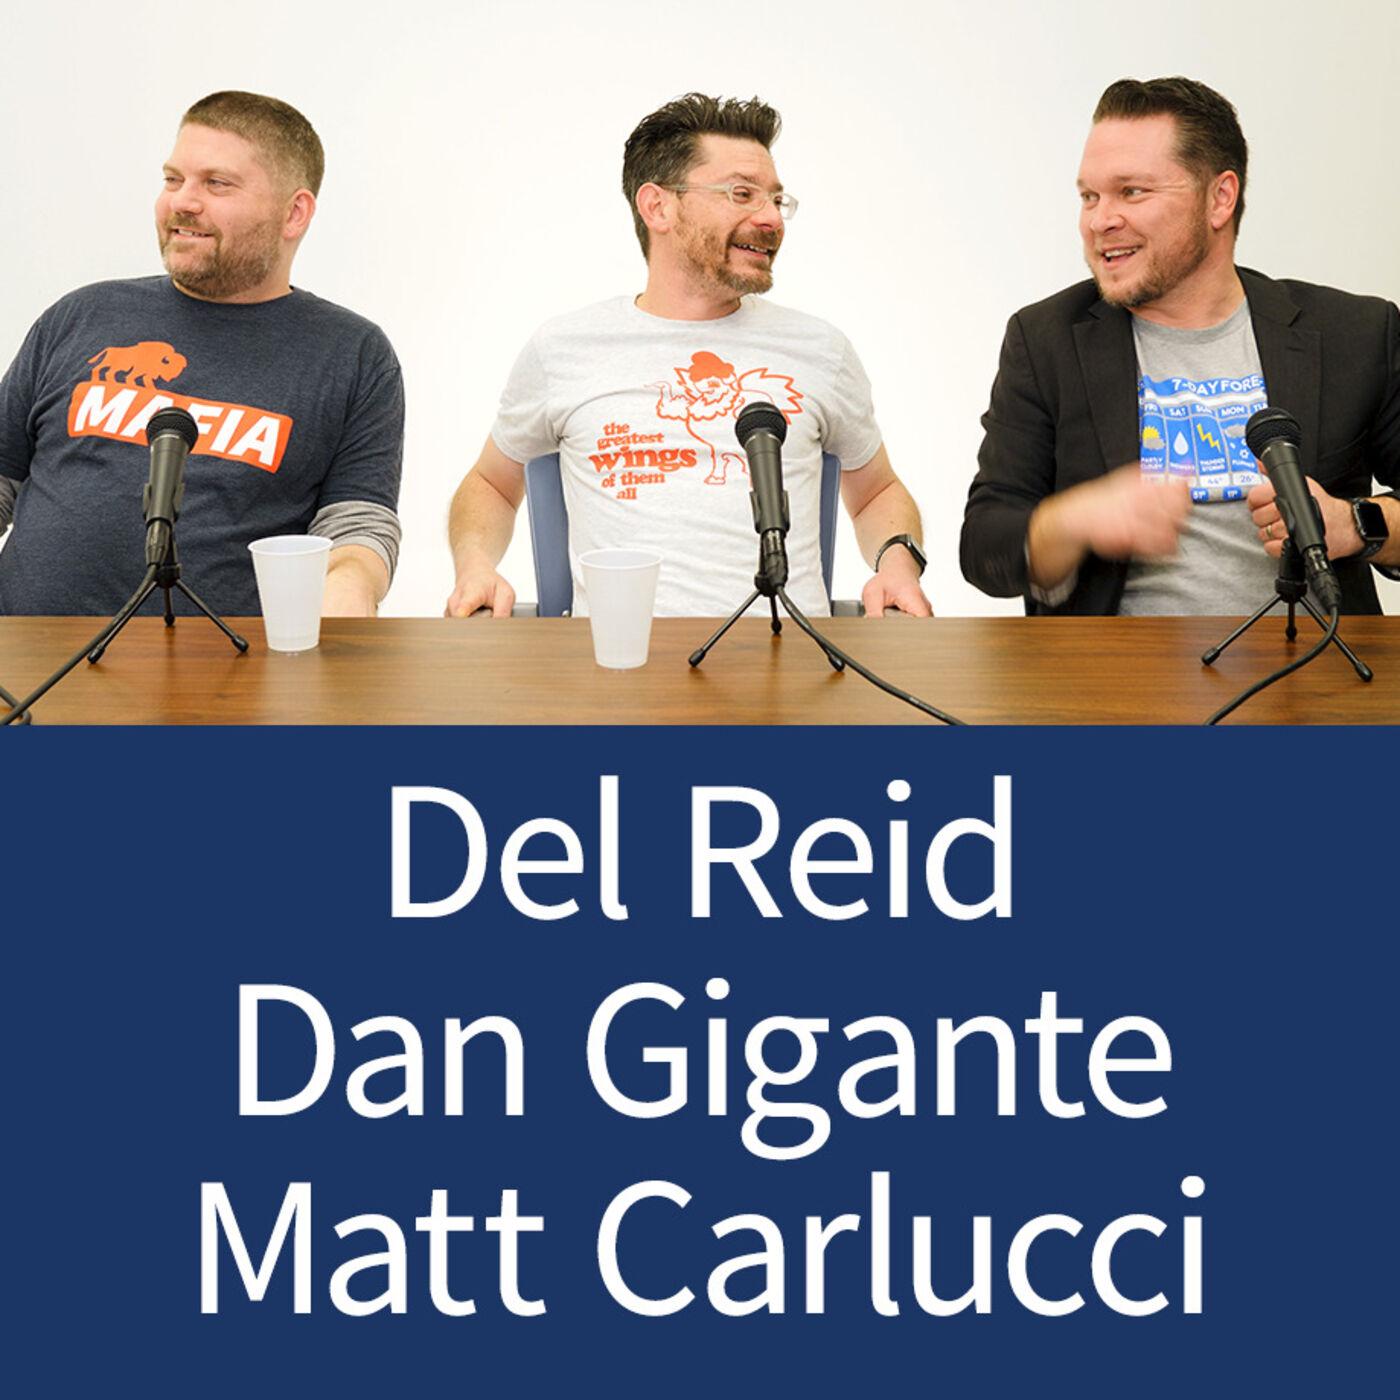 Del Reid, Dan Gigante, and Matt Carlucci - Founder Stories and Community - Episode 13